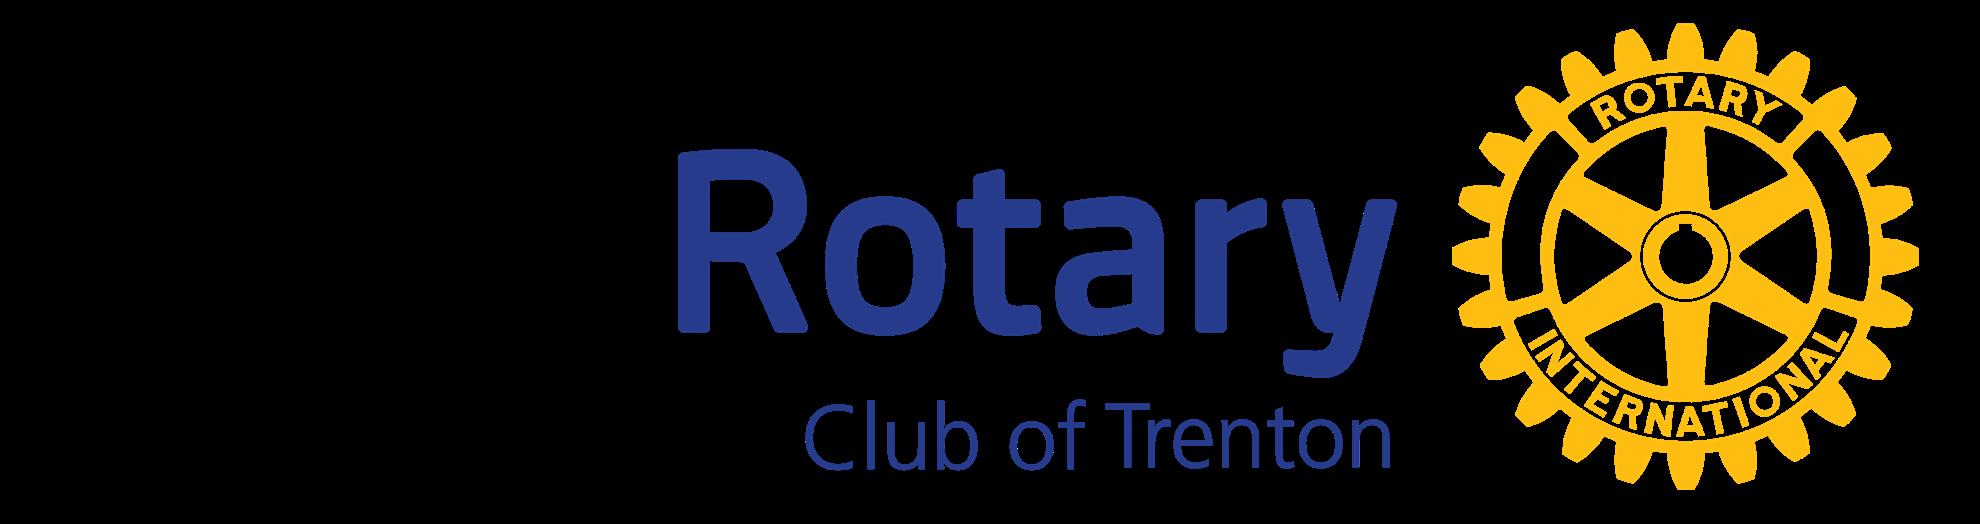 Home Page Rotary Club Of Trenton